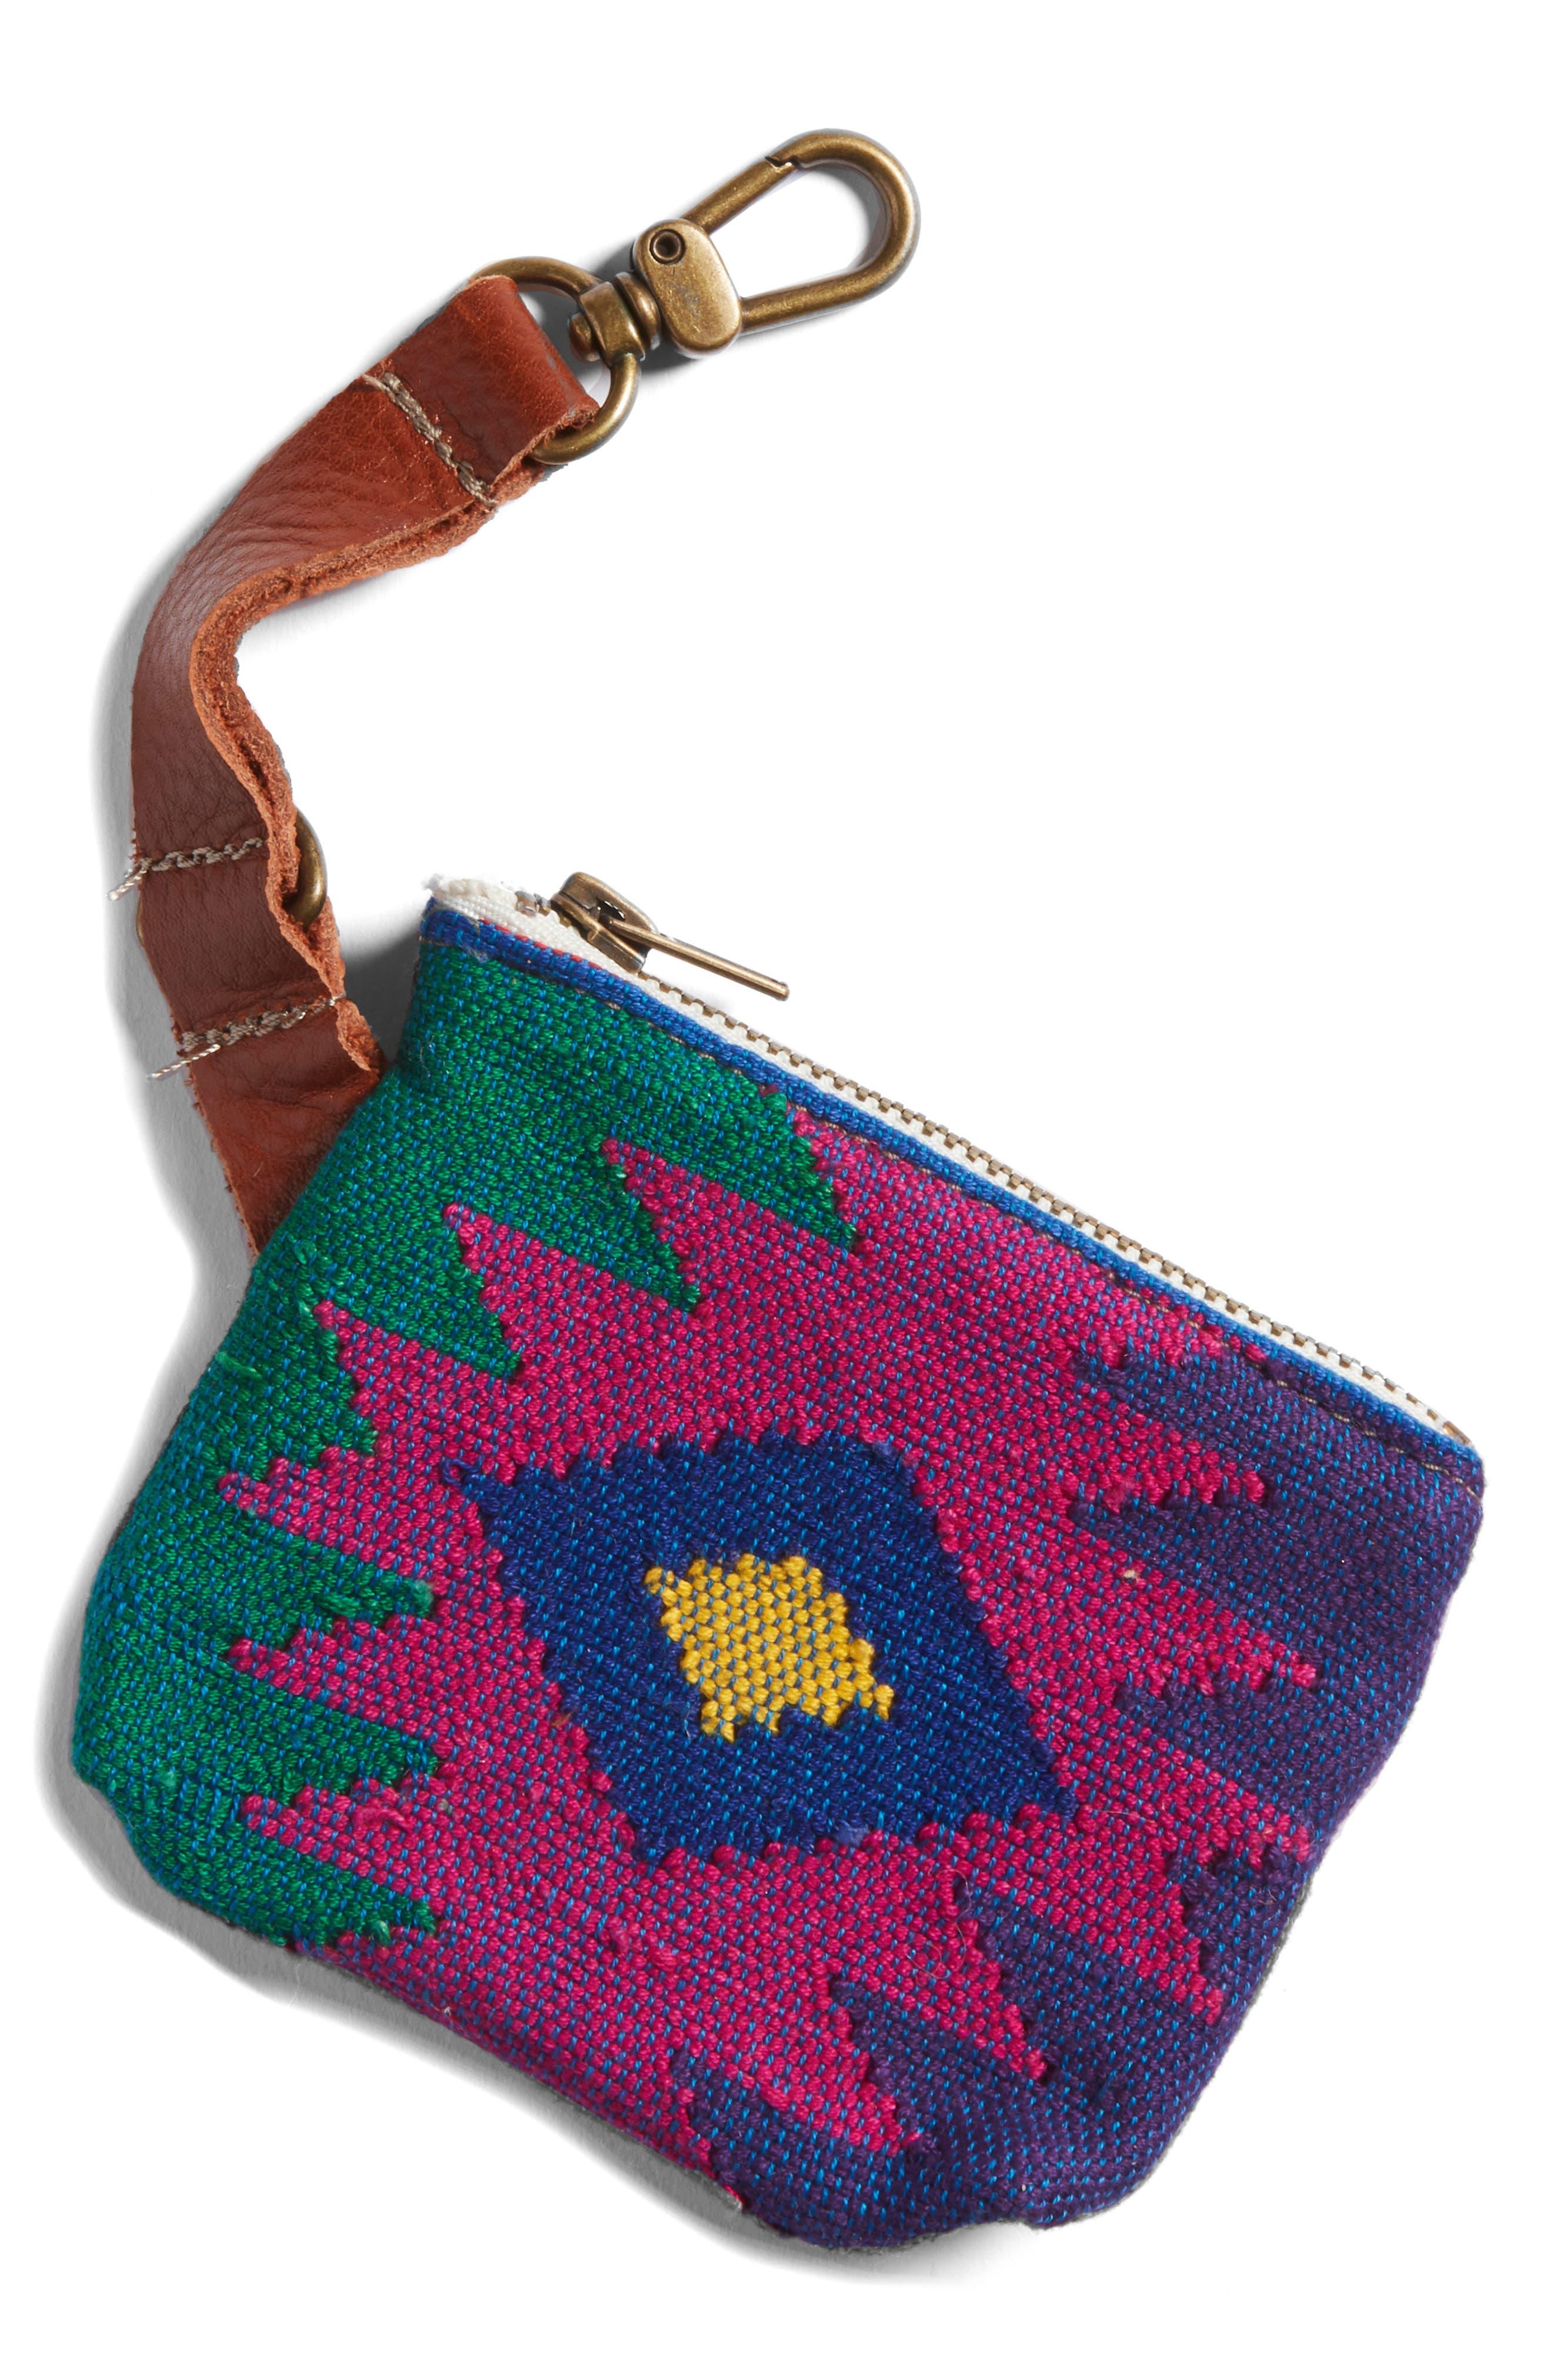 Oaxaca Sunburst Waste Bag Pouch,                             Main thumbnail 1, color,                             Oxaca Green/ Purple